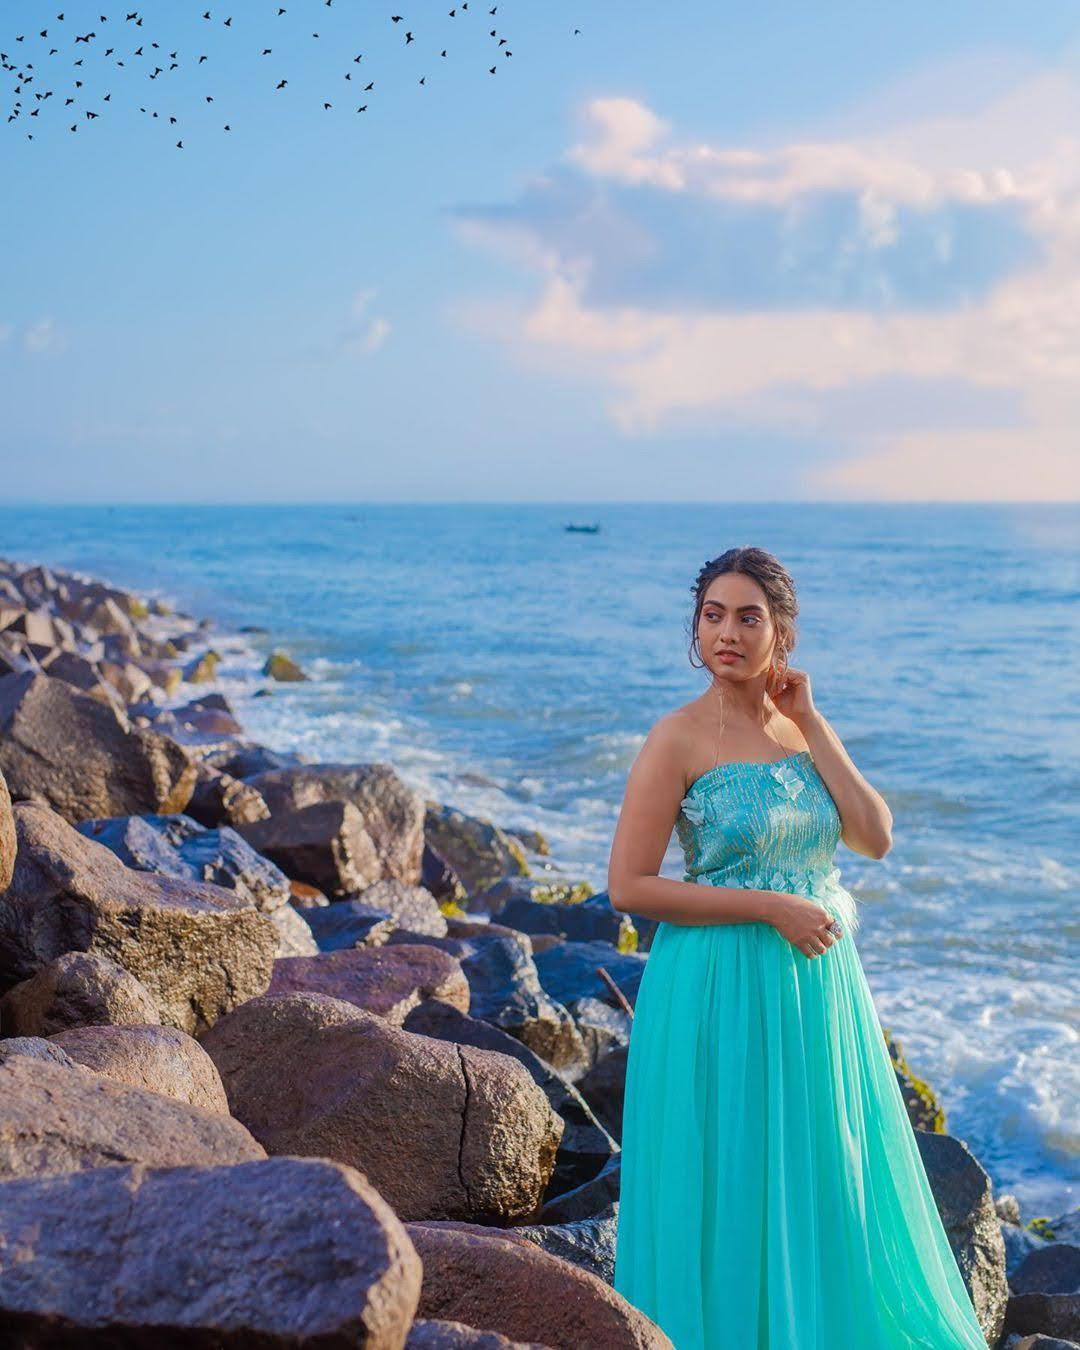 pavithra-janani-64696